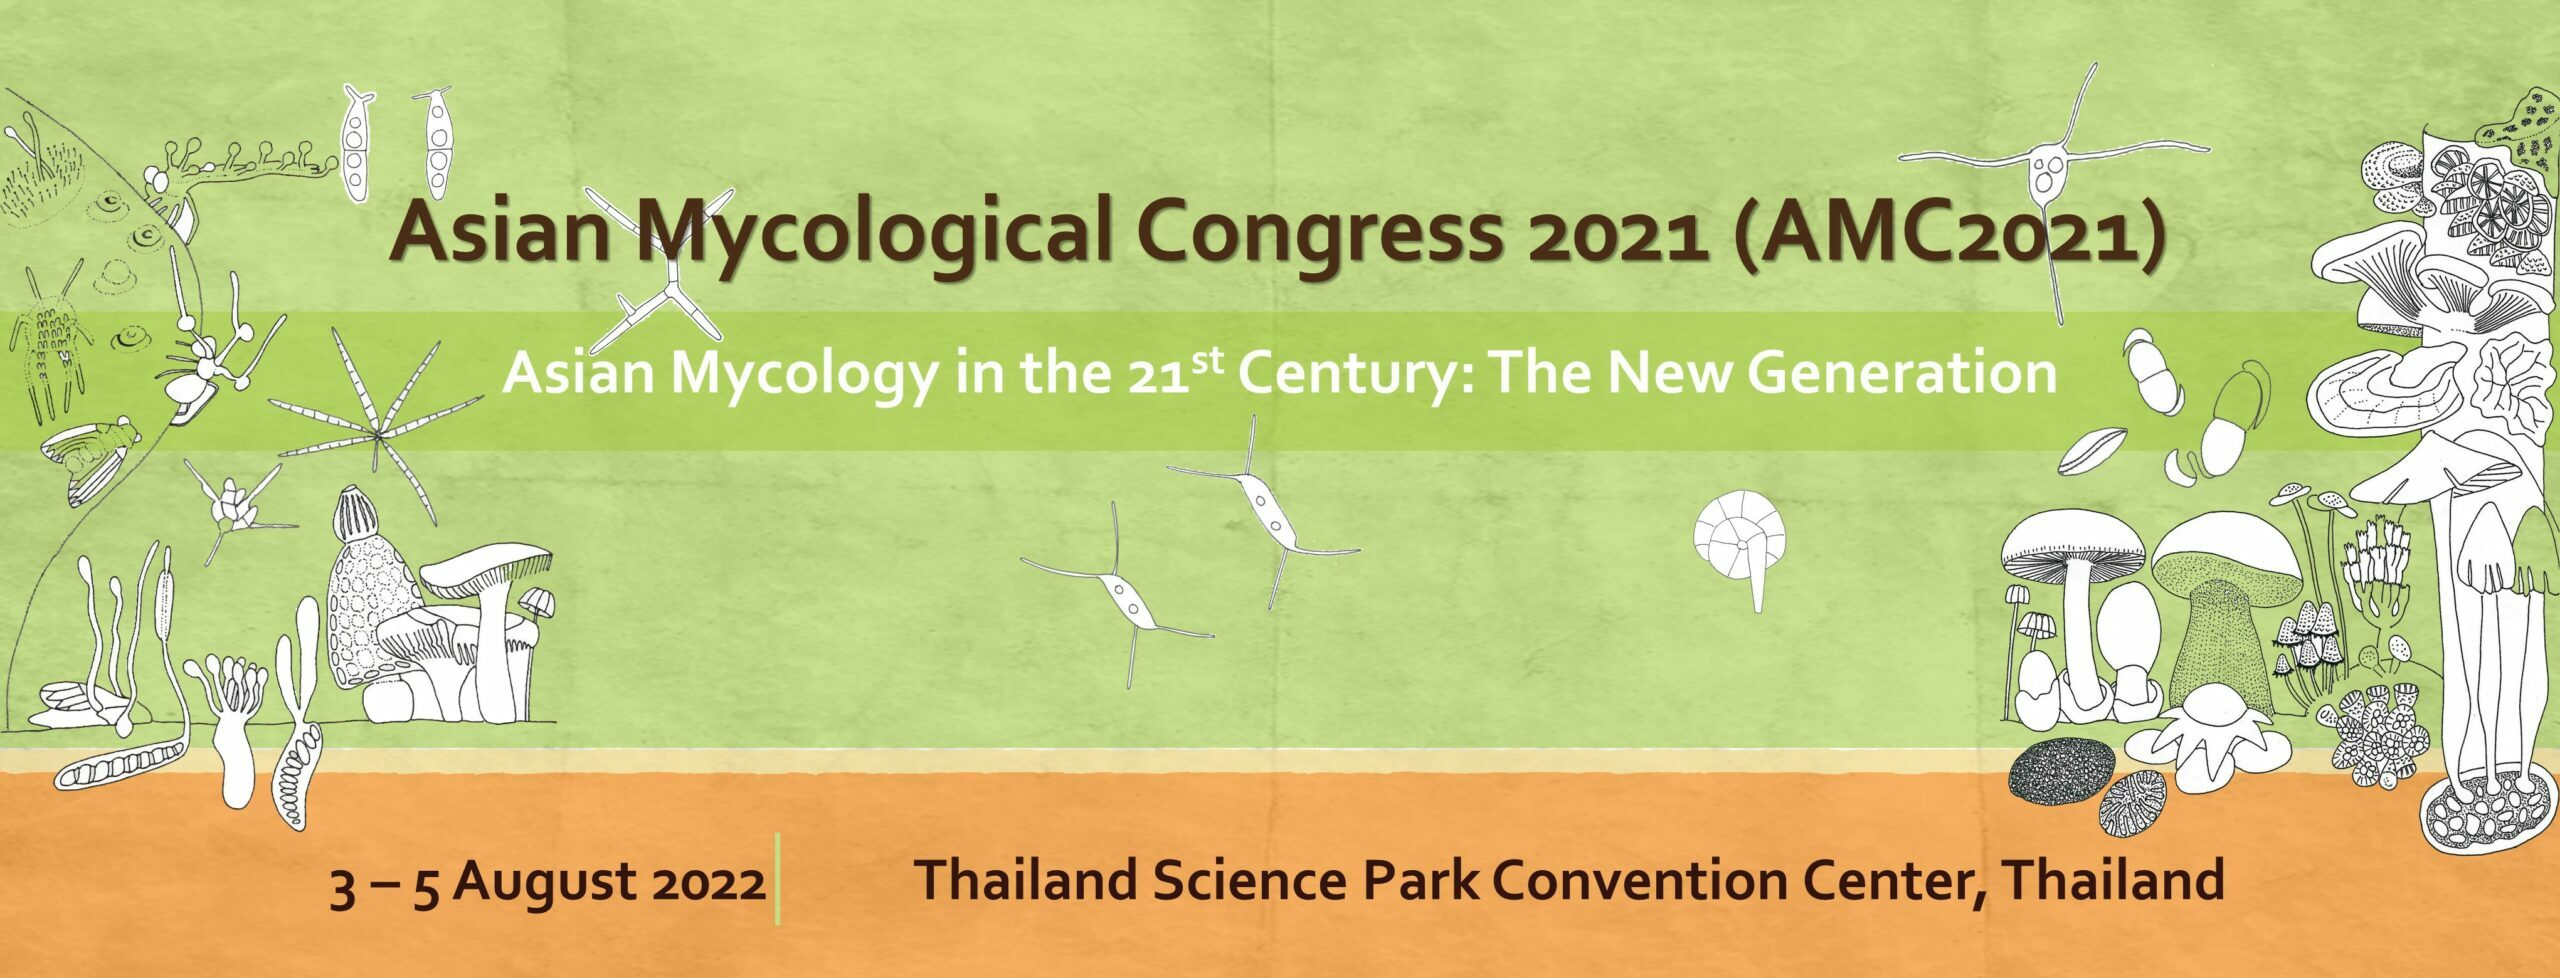 Asian Mycological Congress 2021 (AMC2021)